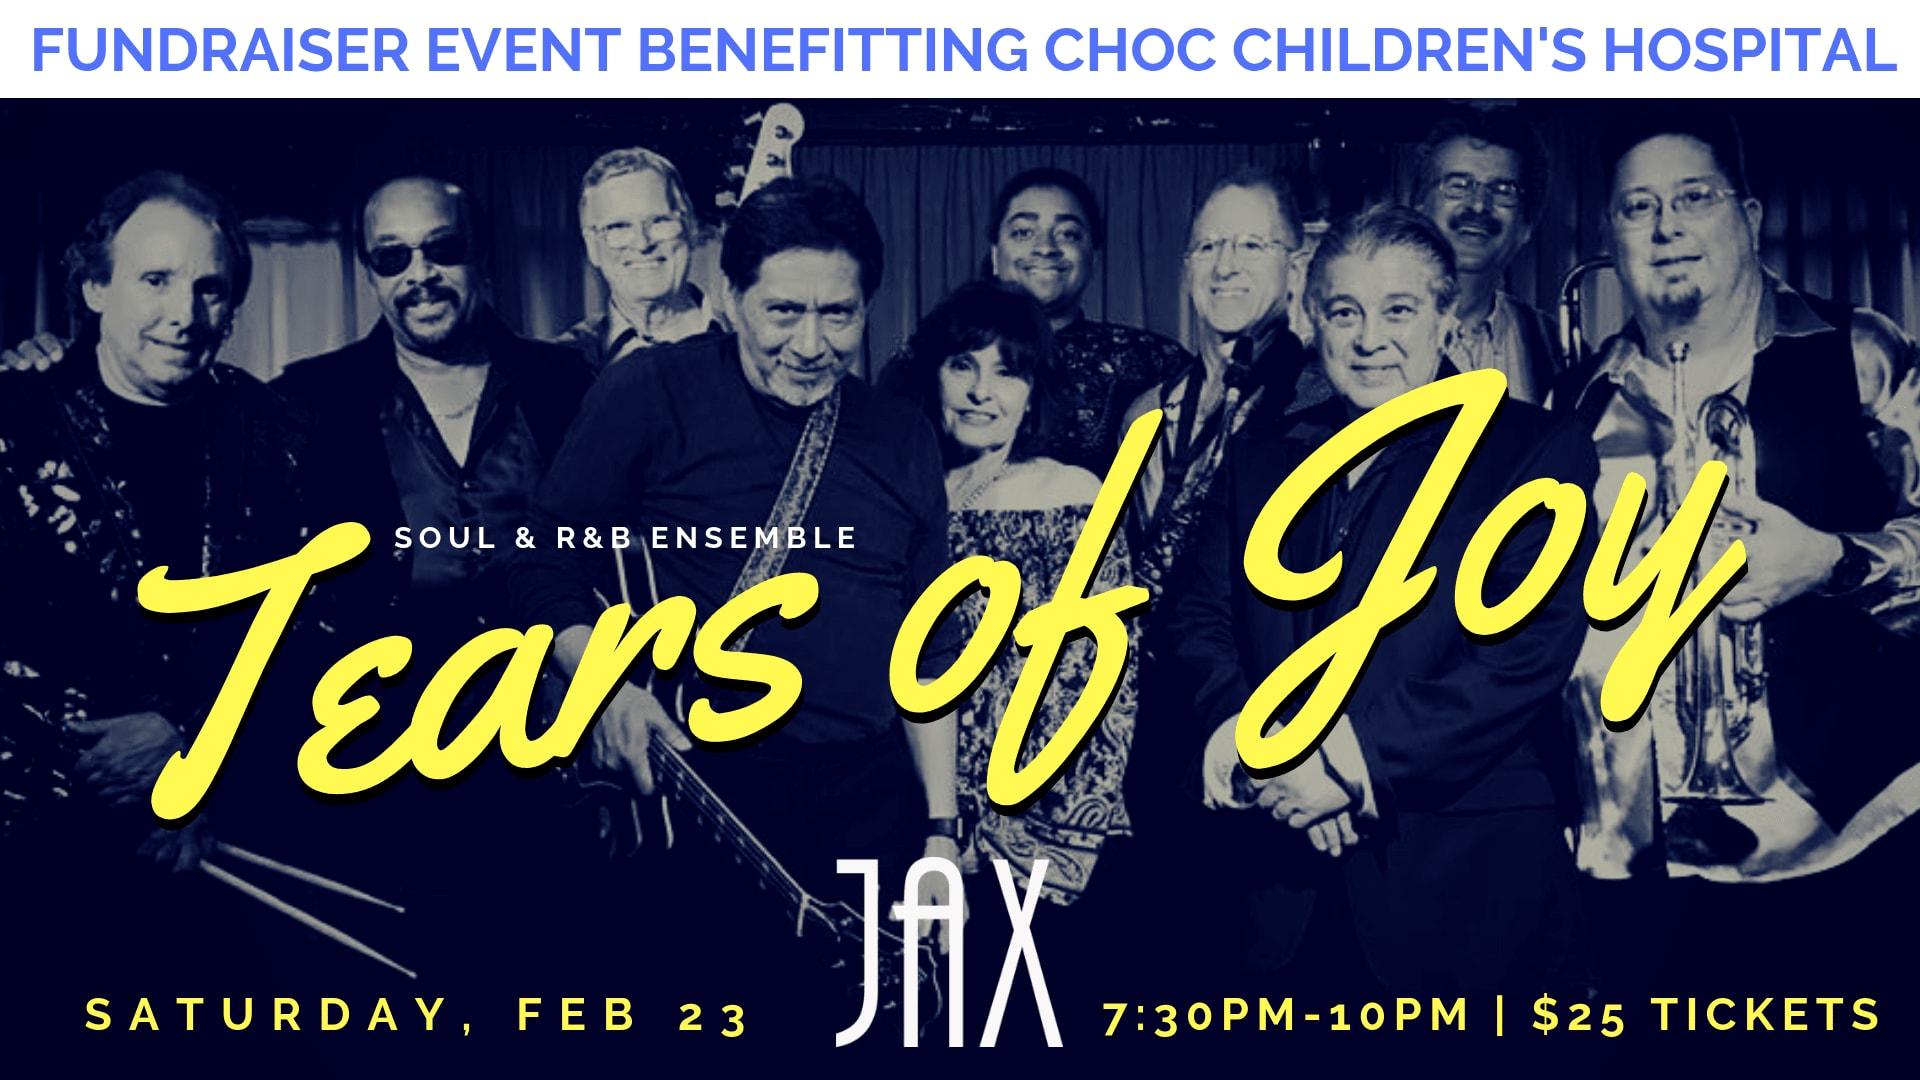 February 23 | TEARS OF JOY CHOC BENEFIT